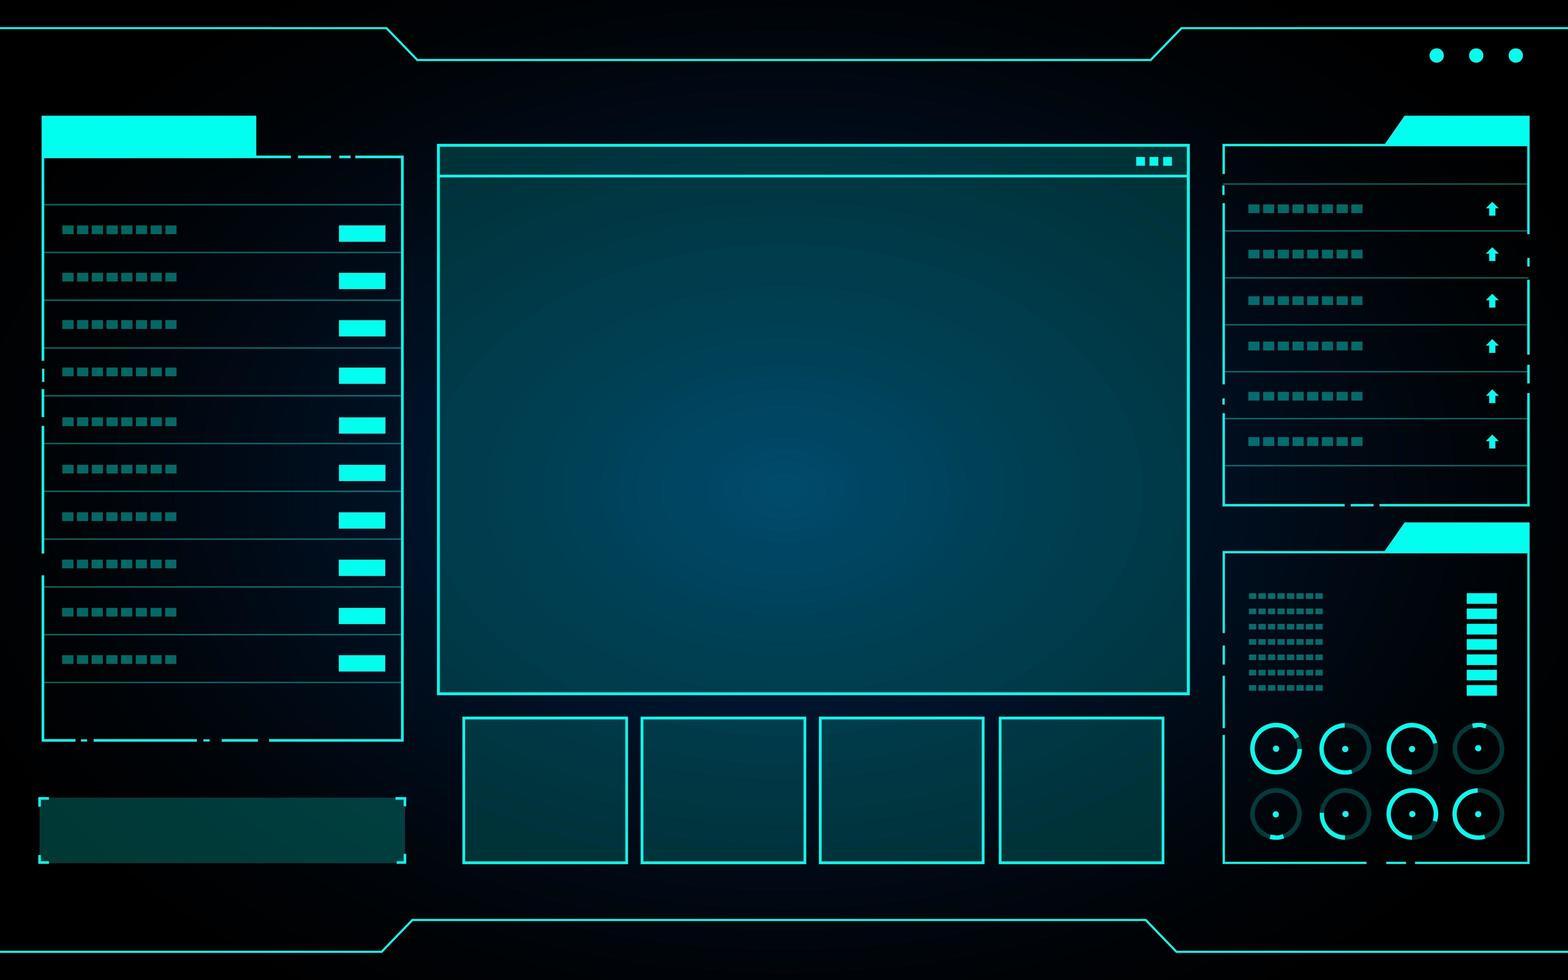 interfaz de tecnología azul hud vector